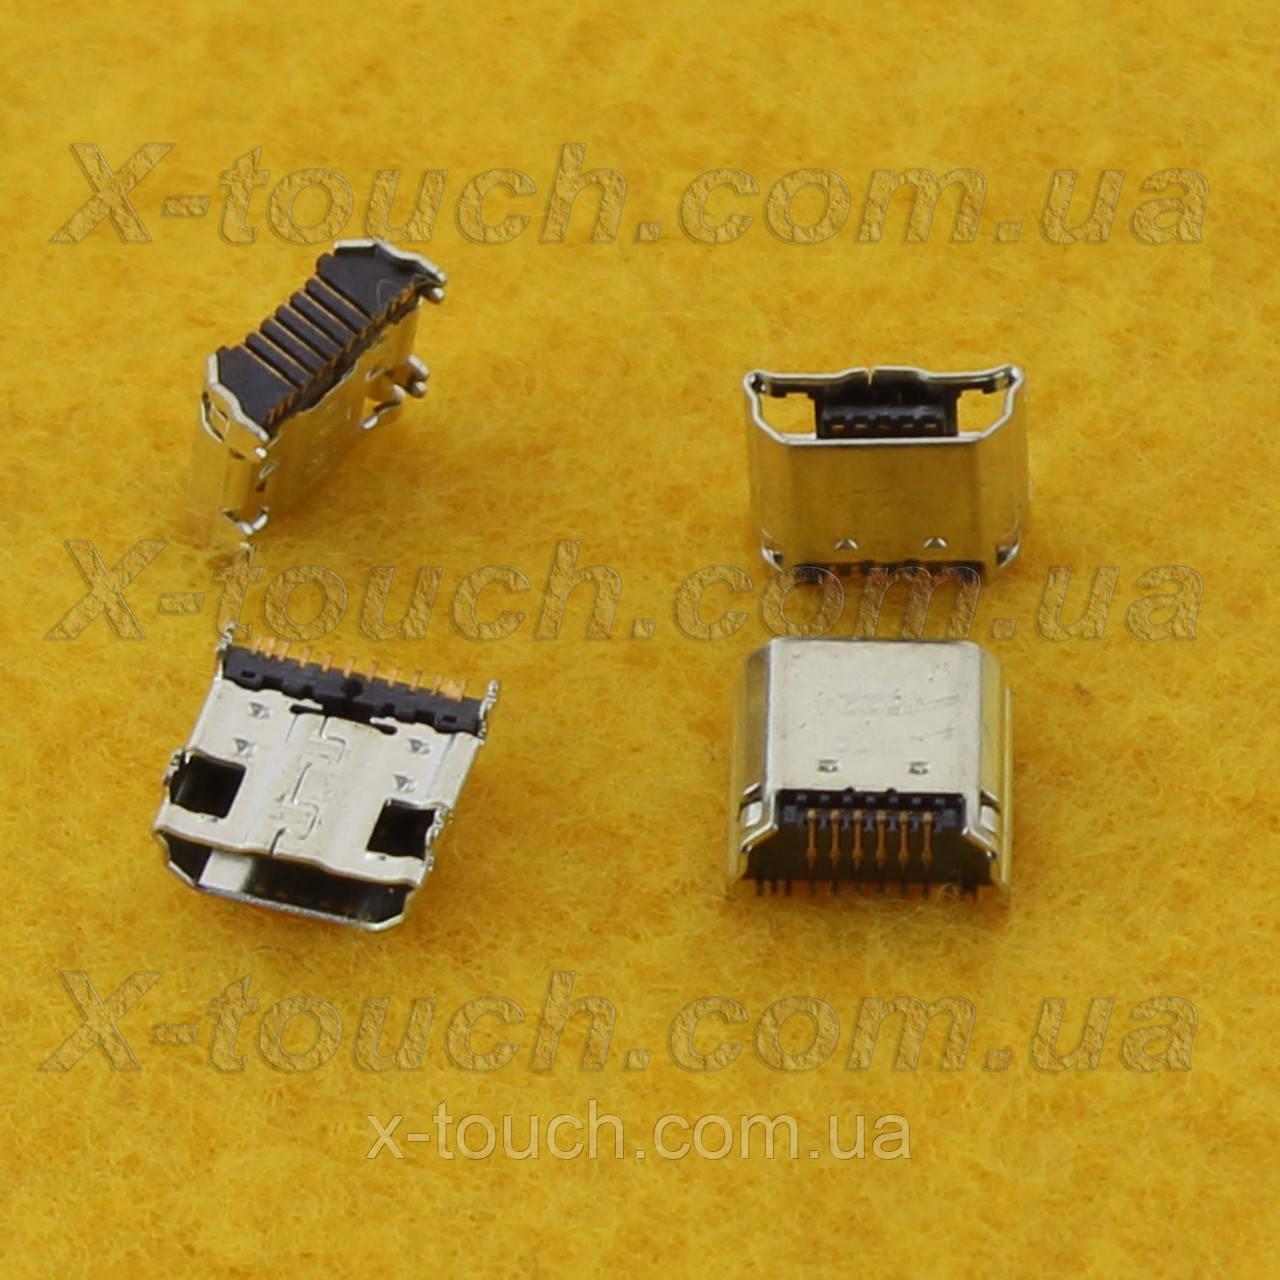 Samsung Galaxy Mega 6.3 GT-I9205 разъем зарядки micro-B USB 11pin